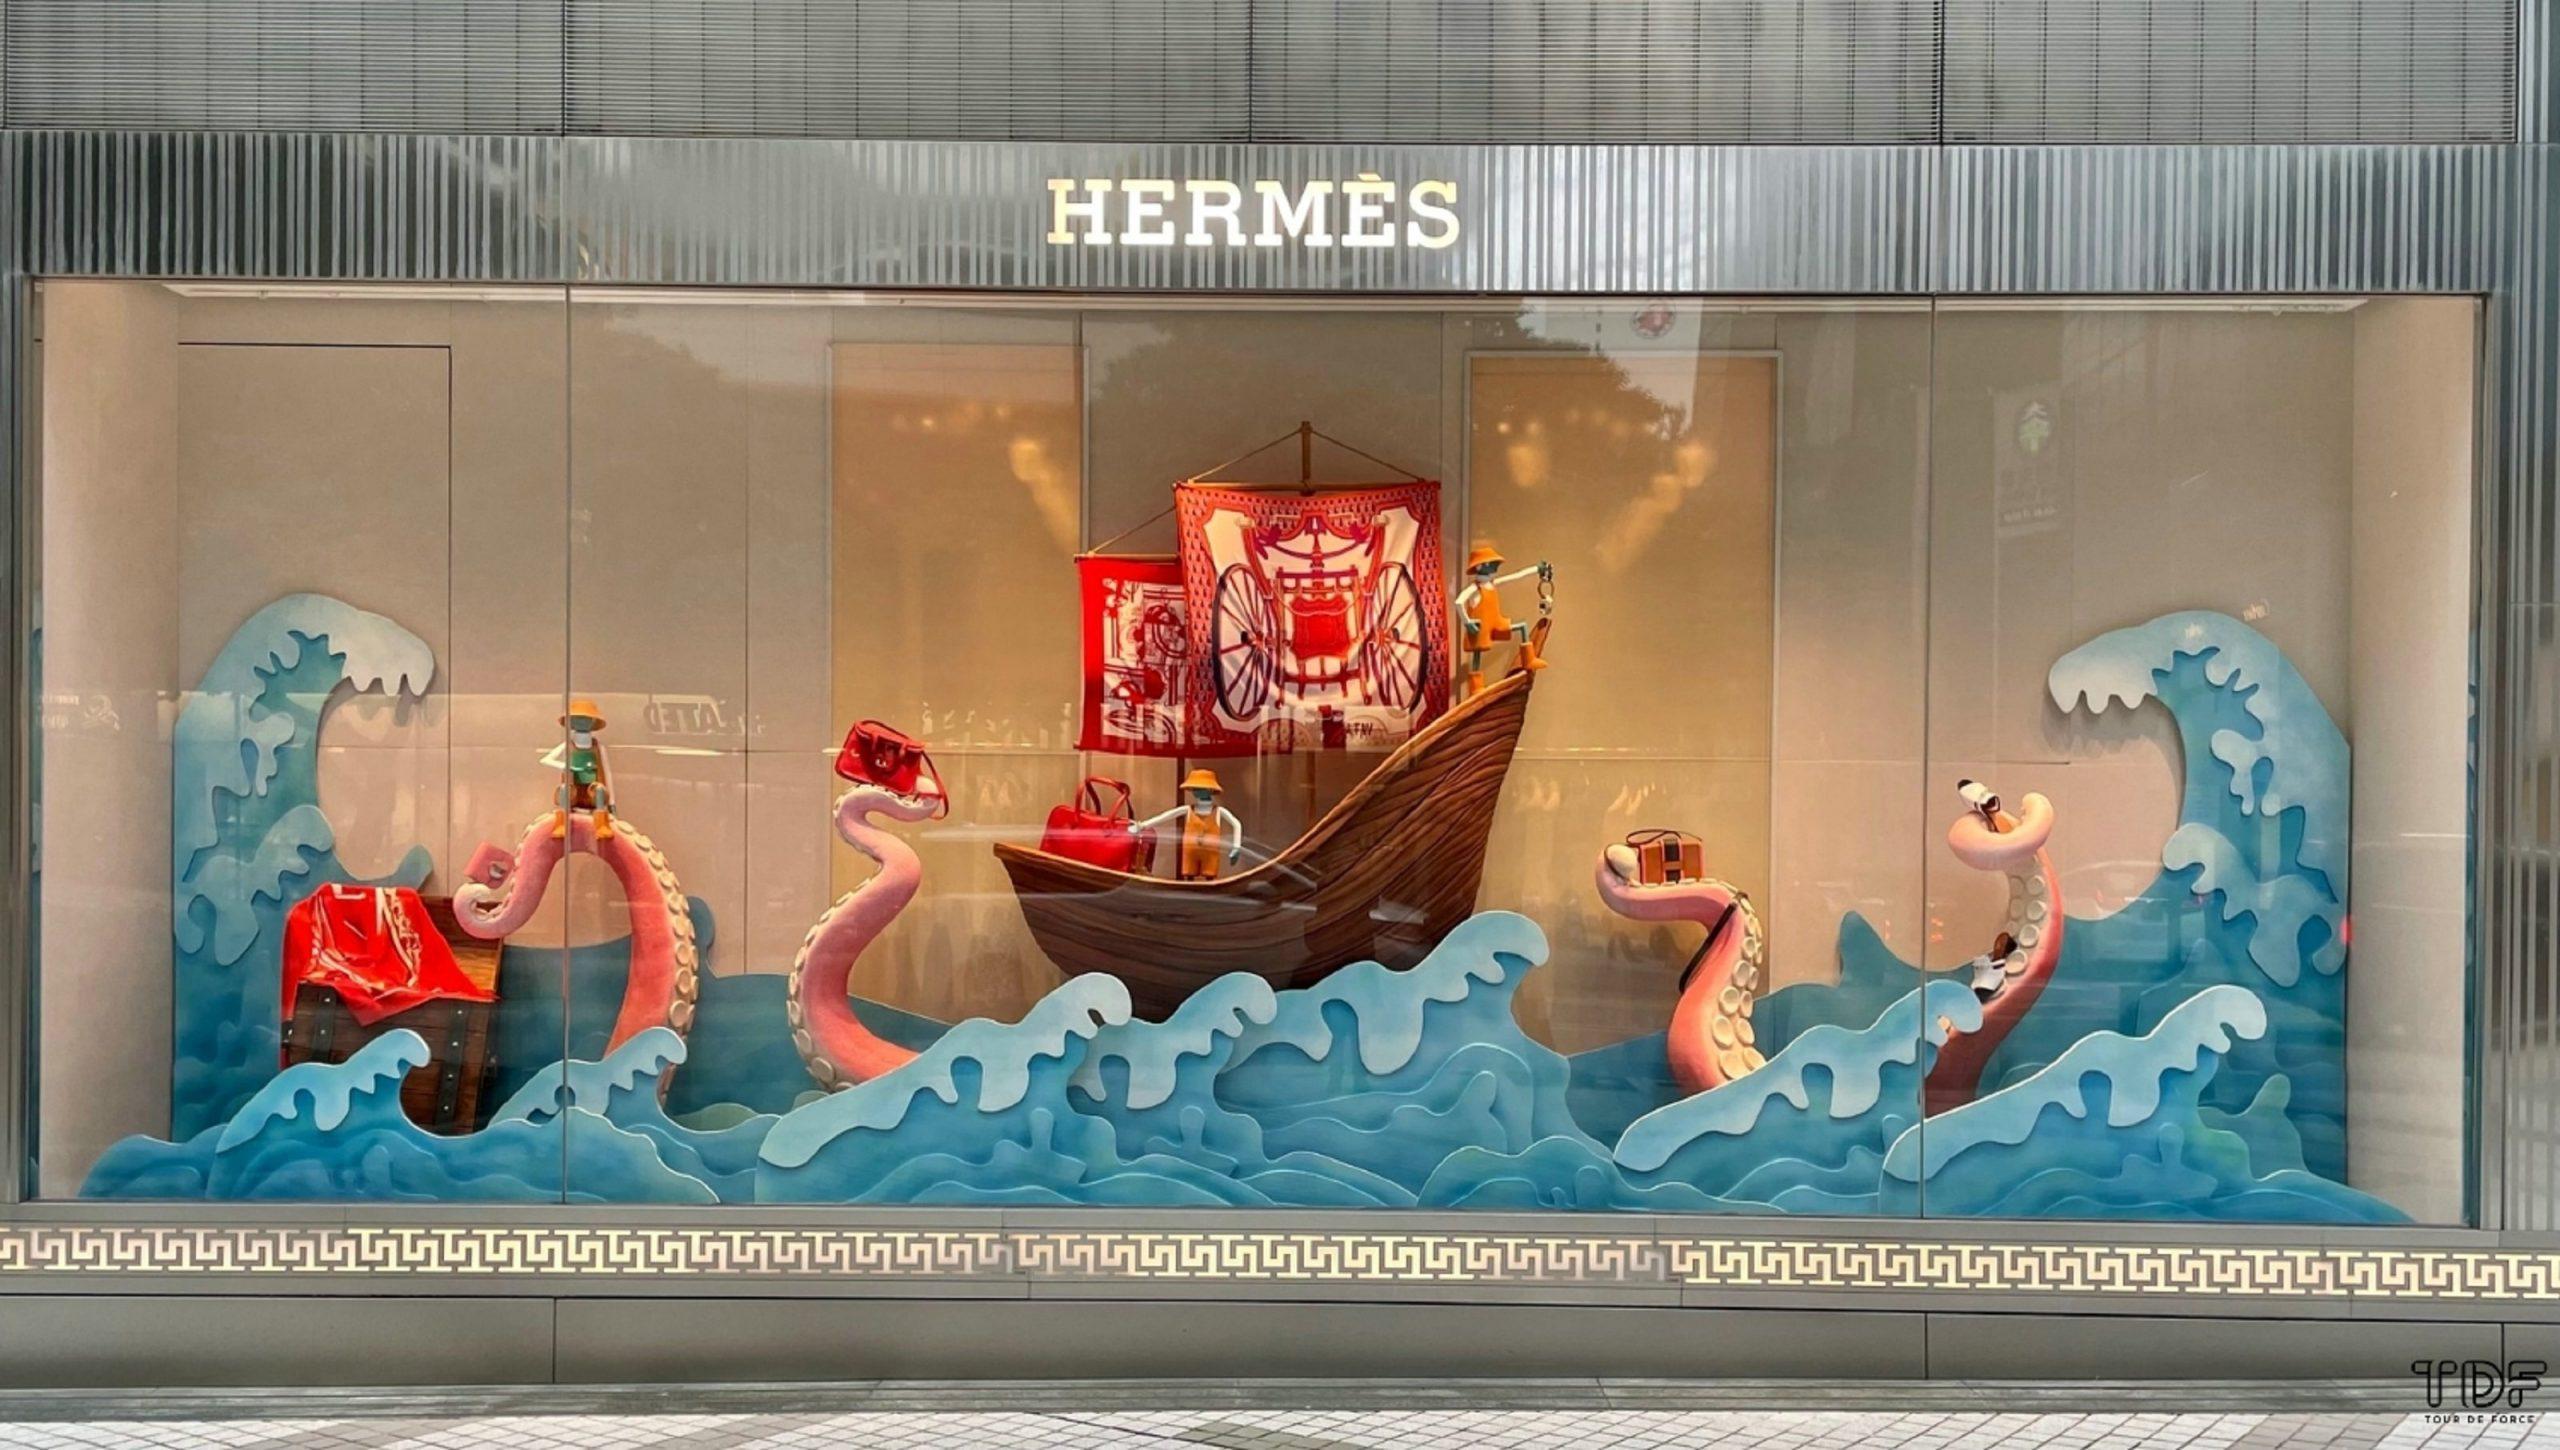 Store window, window display, Hermes Resort 2021 Ready-to-Wear collection, Visual merchandising